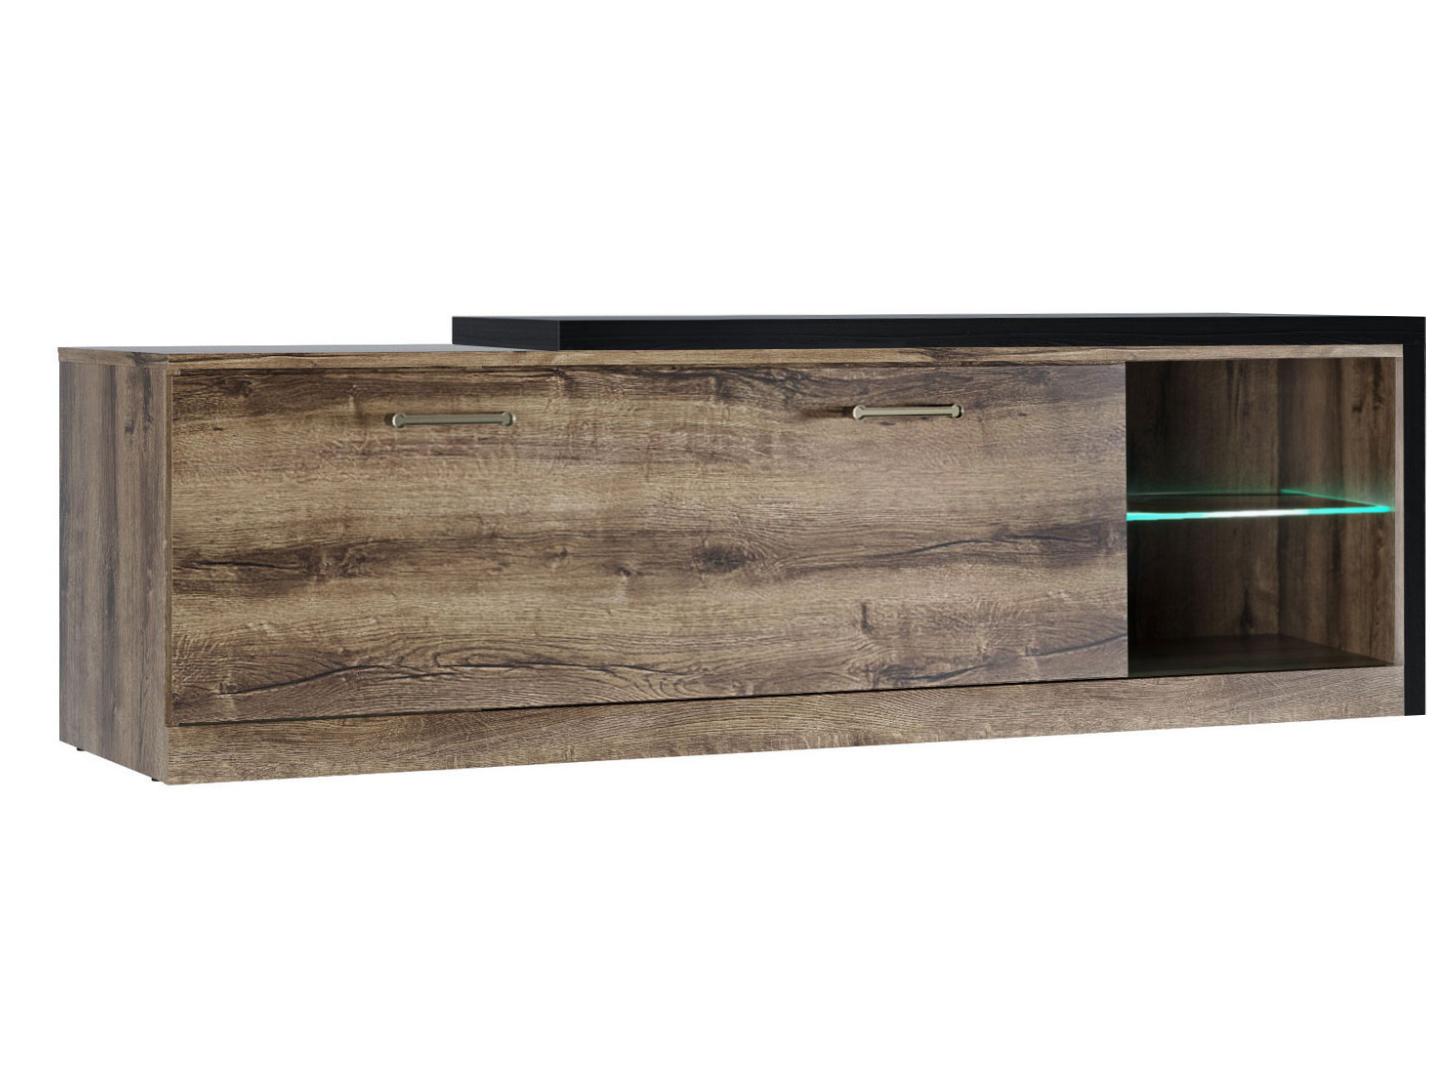 ТВ-тумба 150-95017